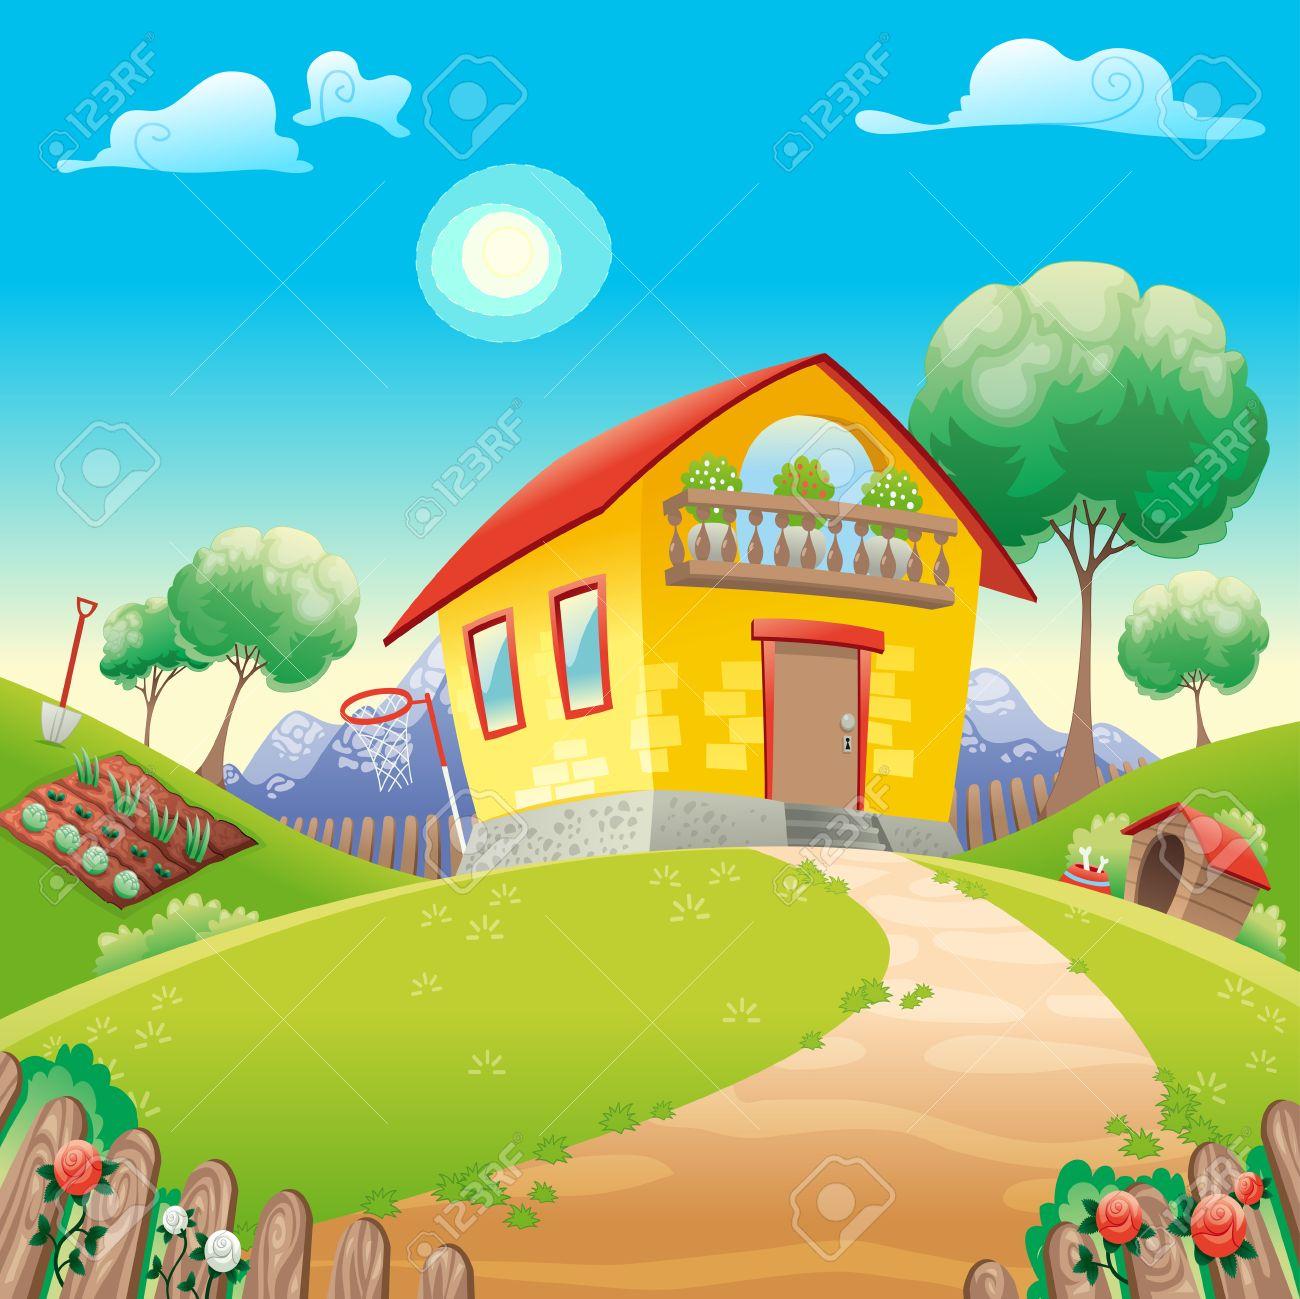 haus mit garten int die landschaft. vector cartoon illustration, Garten ideen